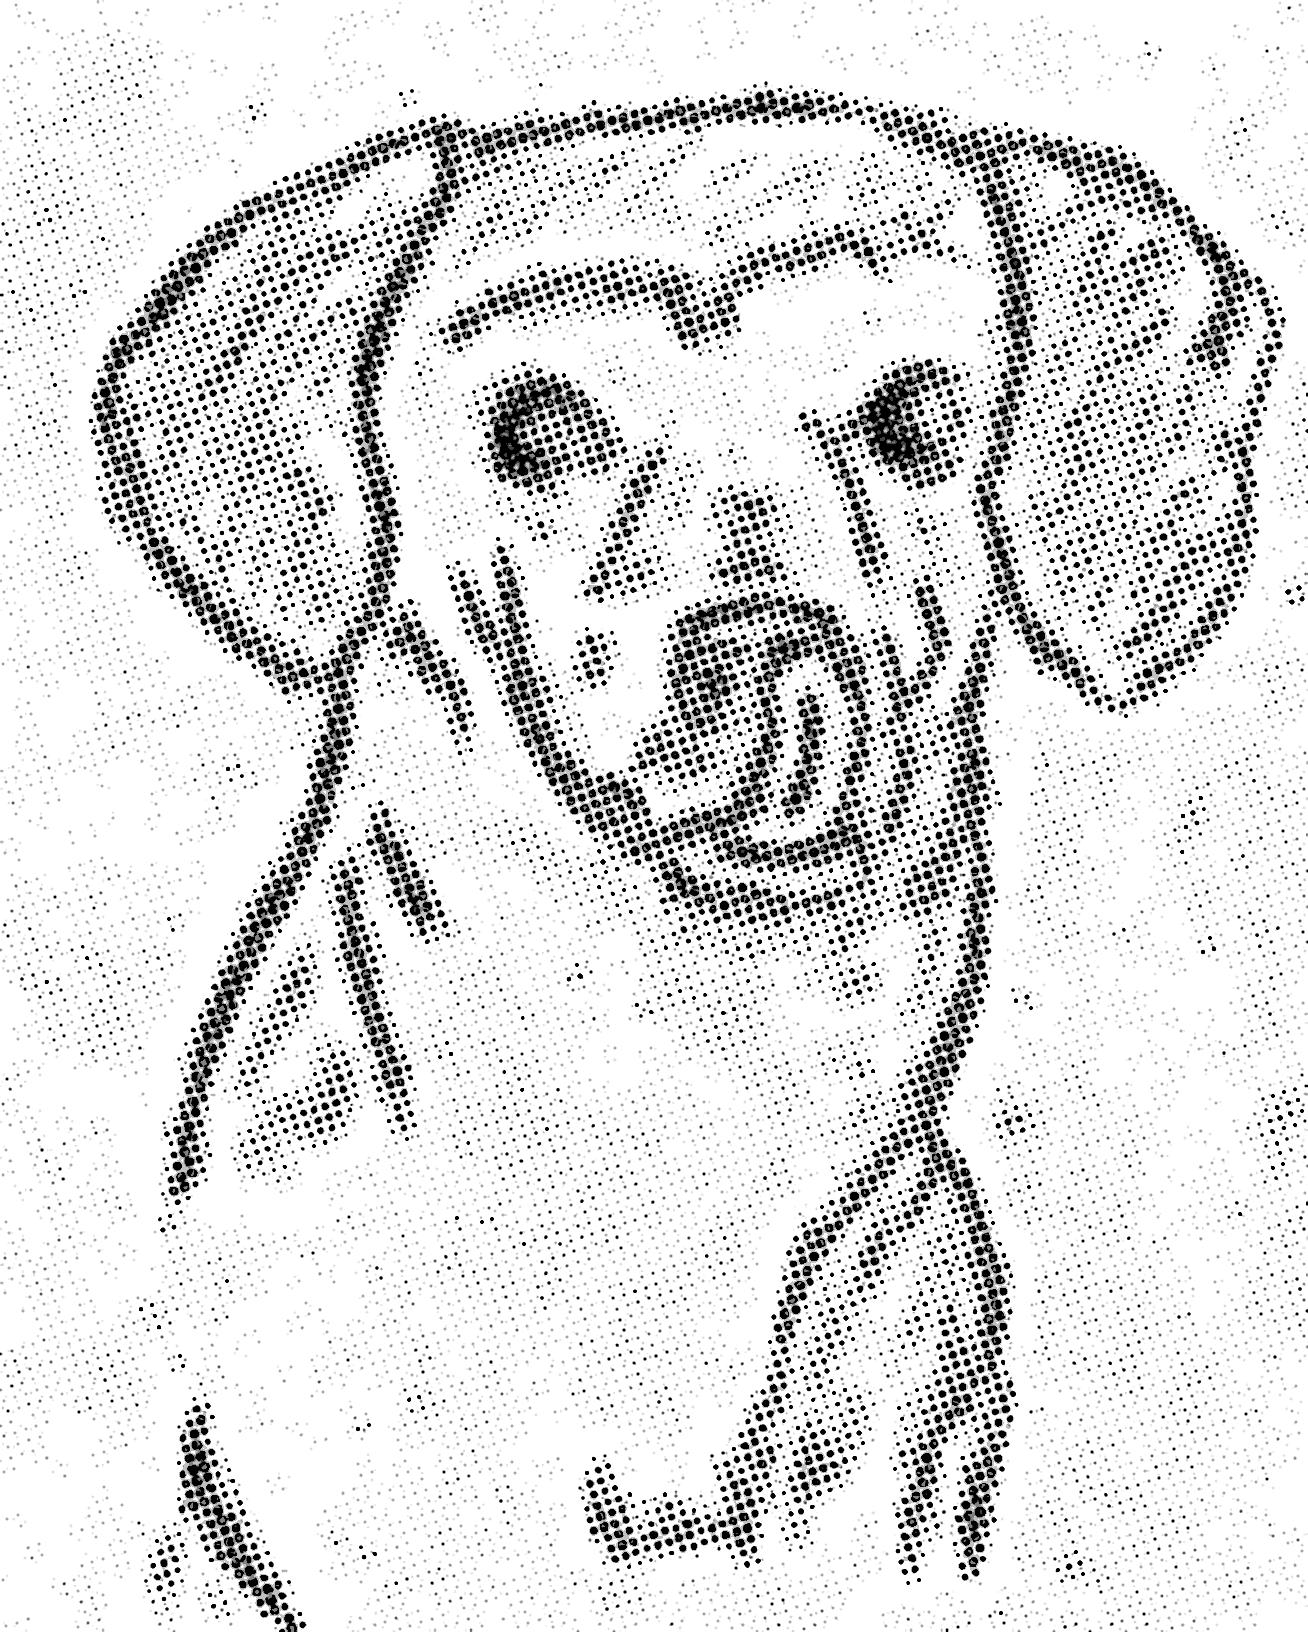 1308x1632 Josie Drawing Dot Matrix General Lordisimo's Apocalypse